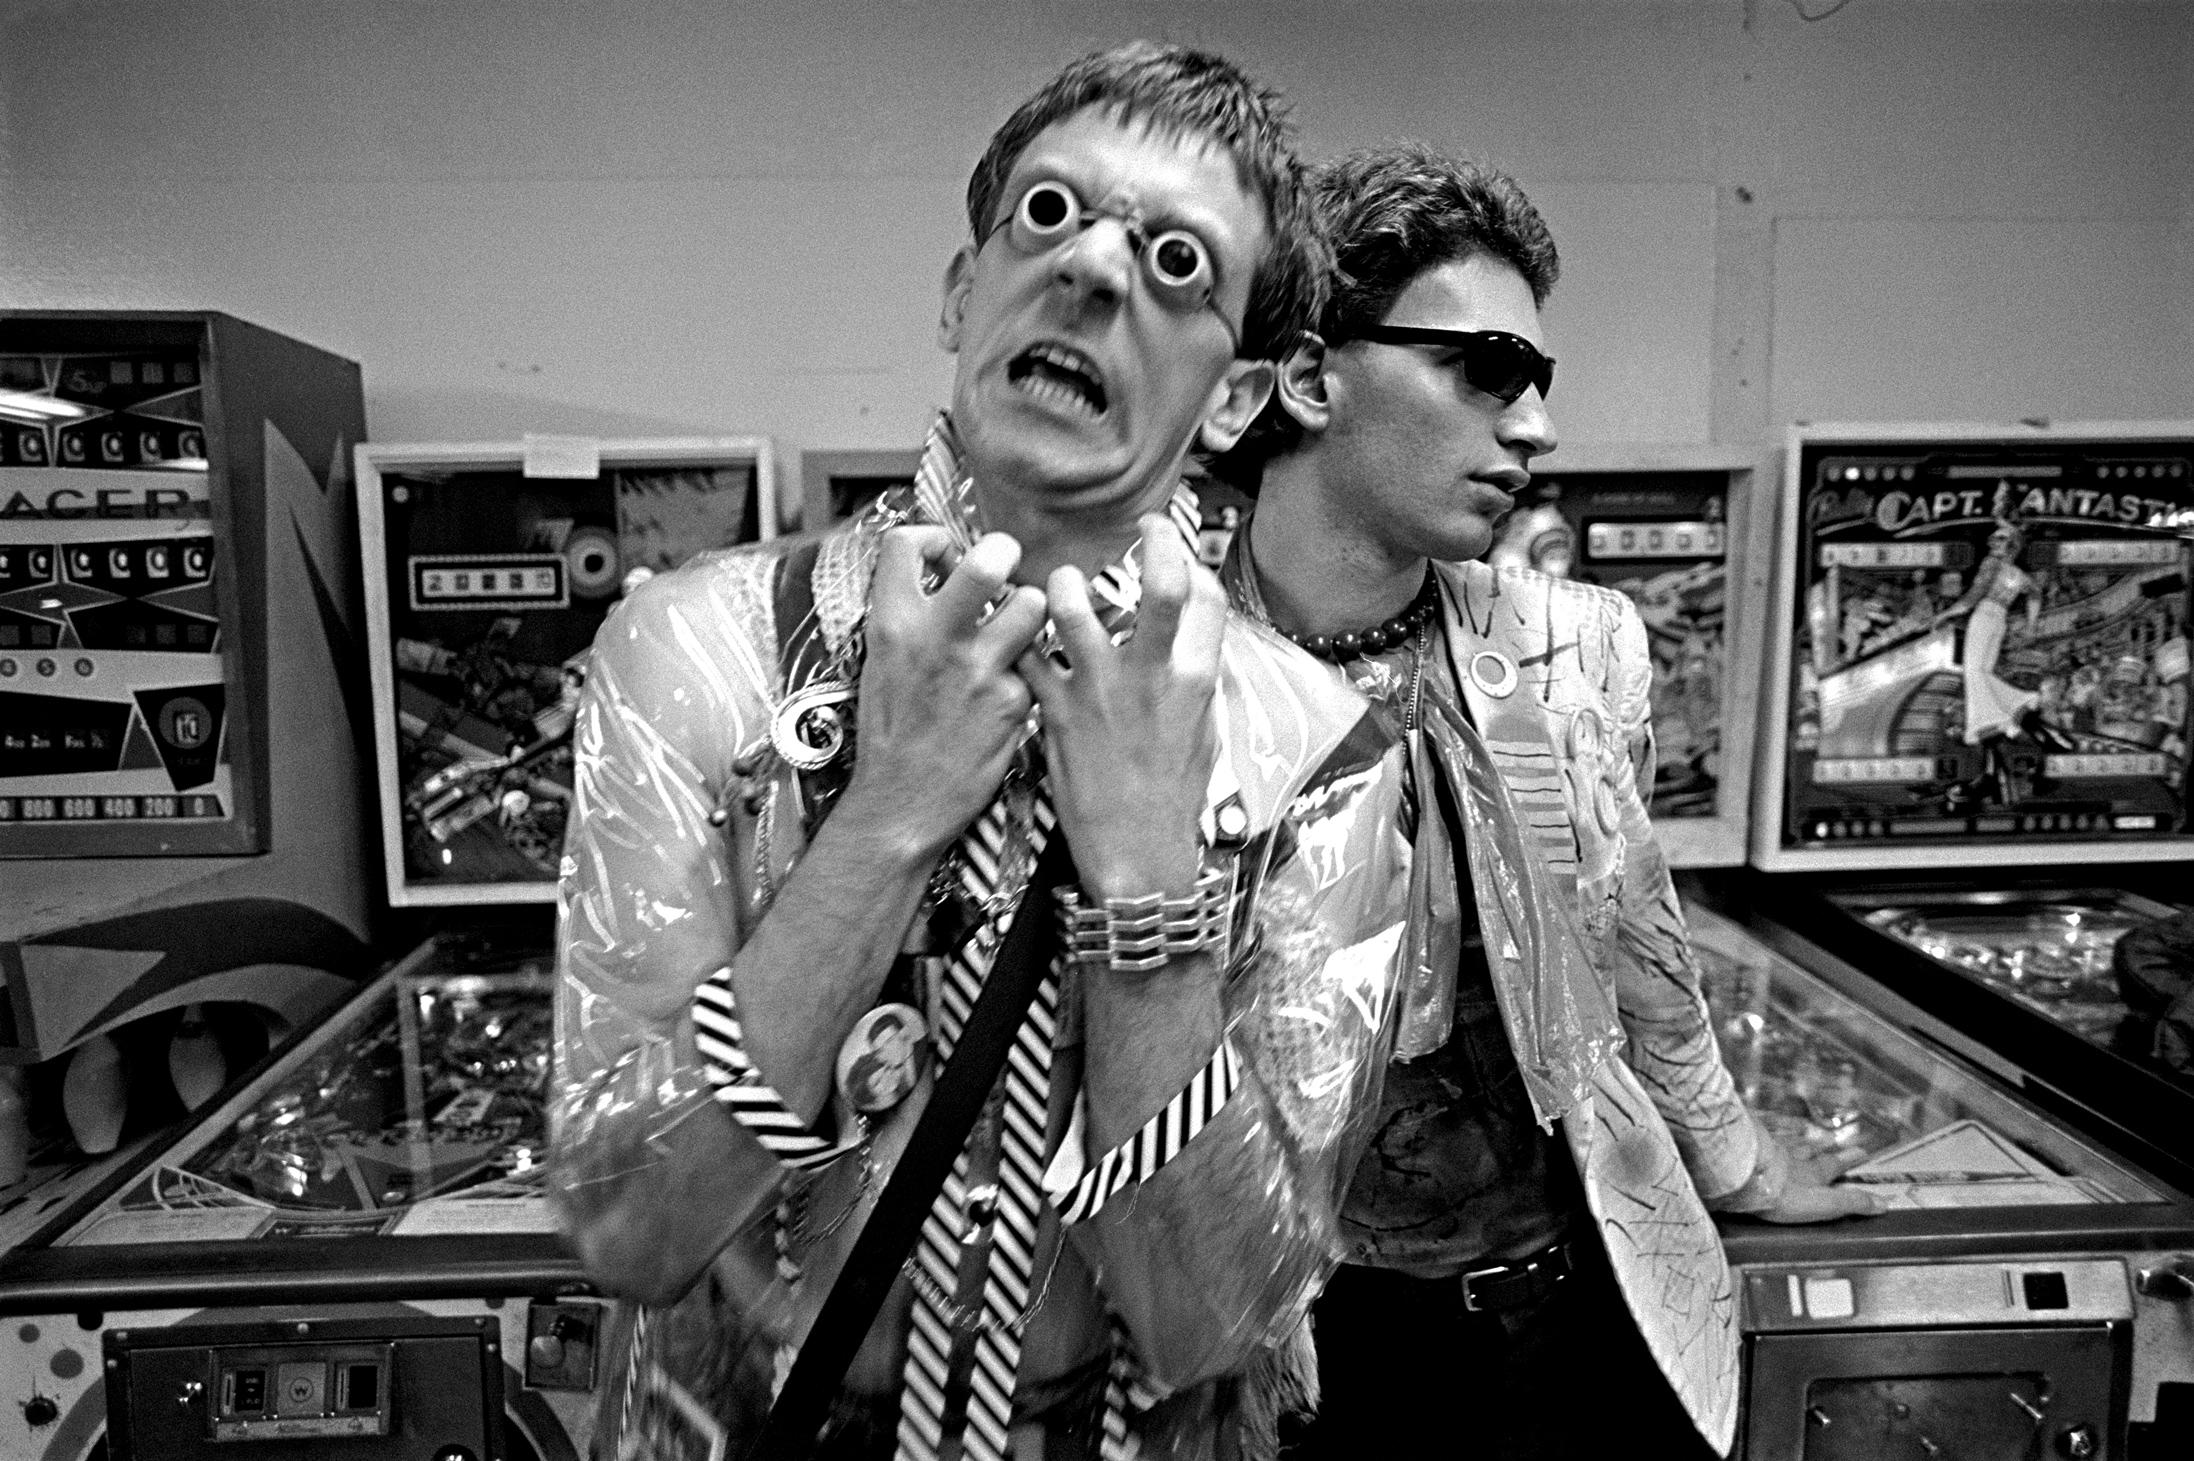 John Denney and Nicky Beat (The Weirdos) in Hollywood, 1977. Photo: Melanie Nissen.